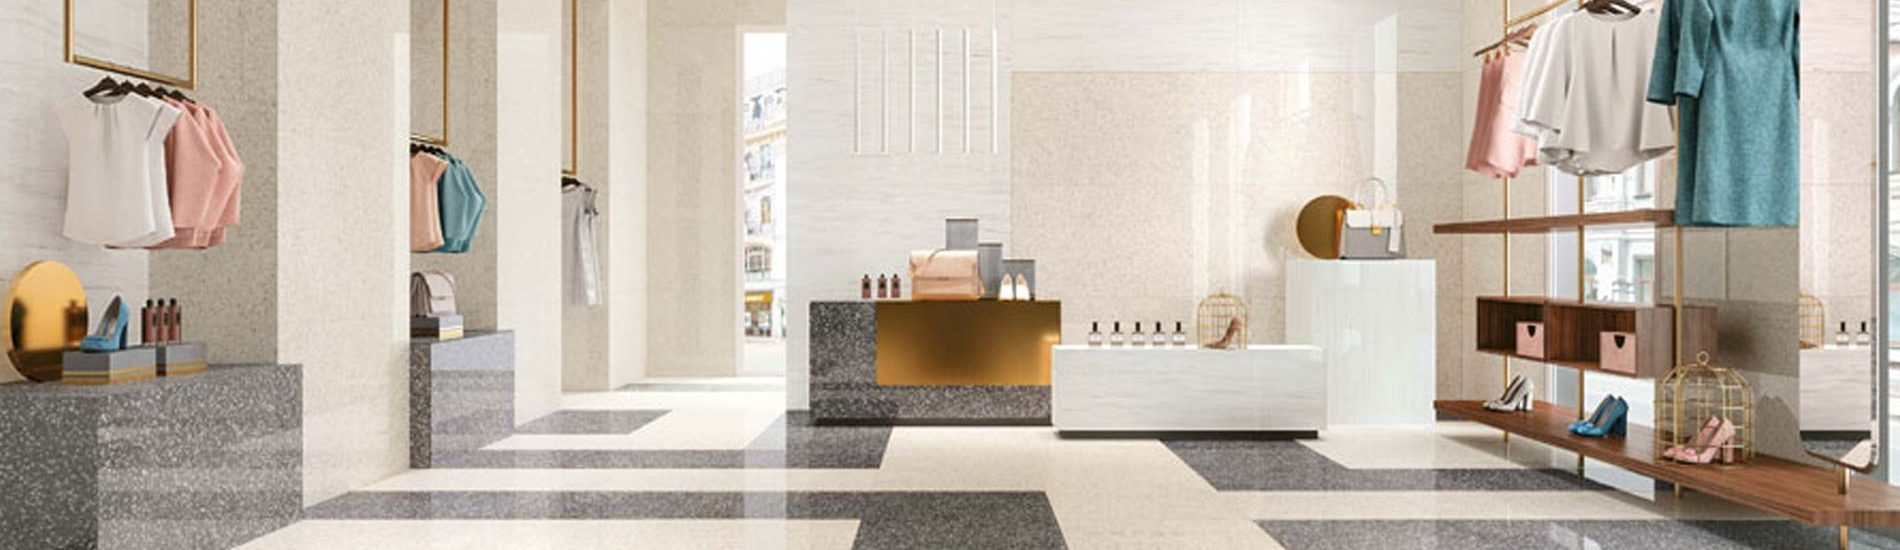 banner-atlas-concorde-marvel-gems-Venetian-Terrazzo-marble-look-italian-floor-wall-tile